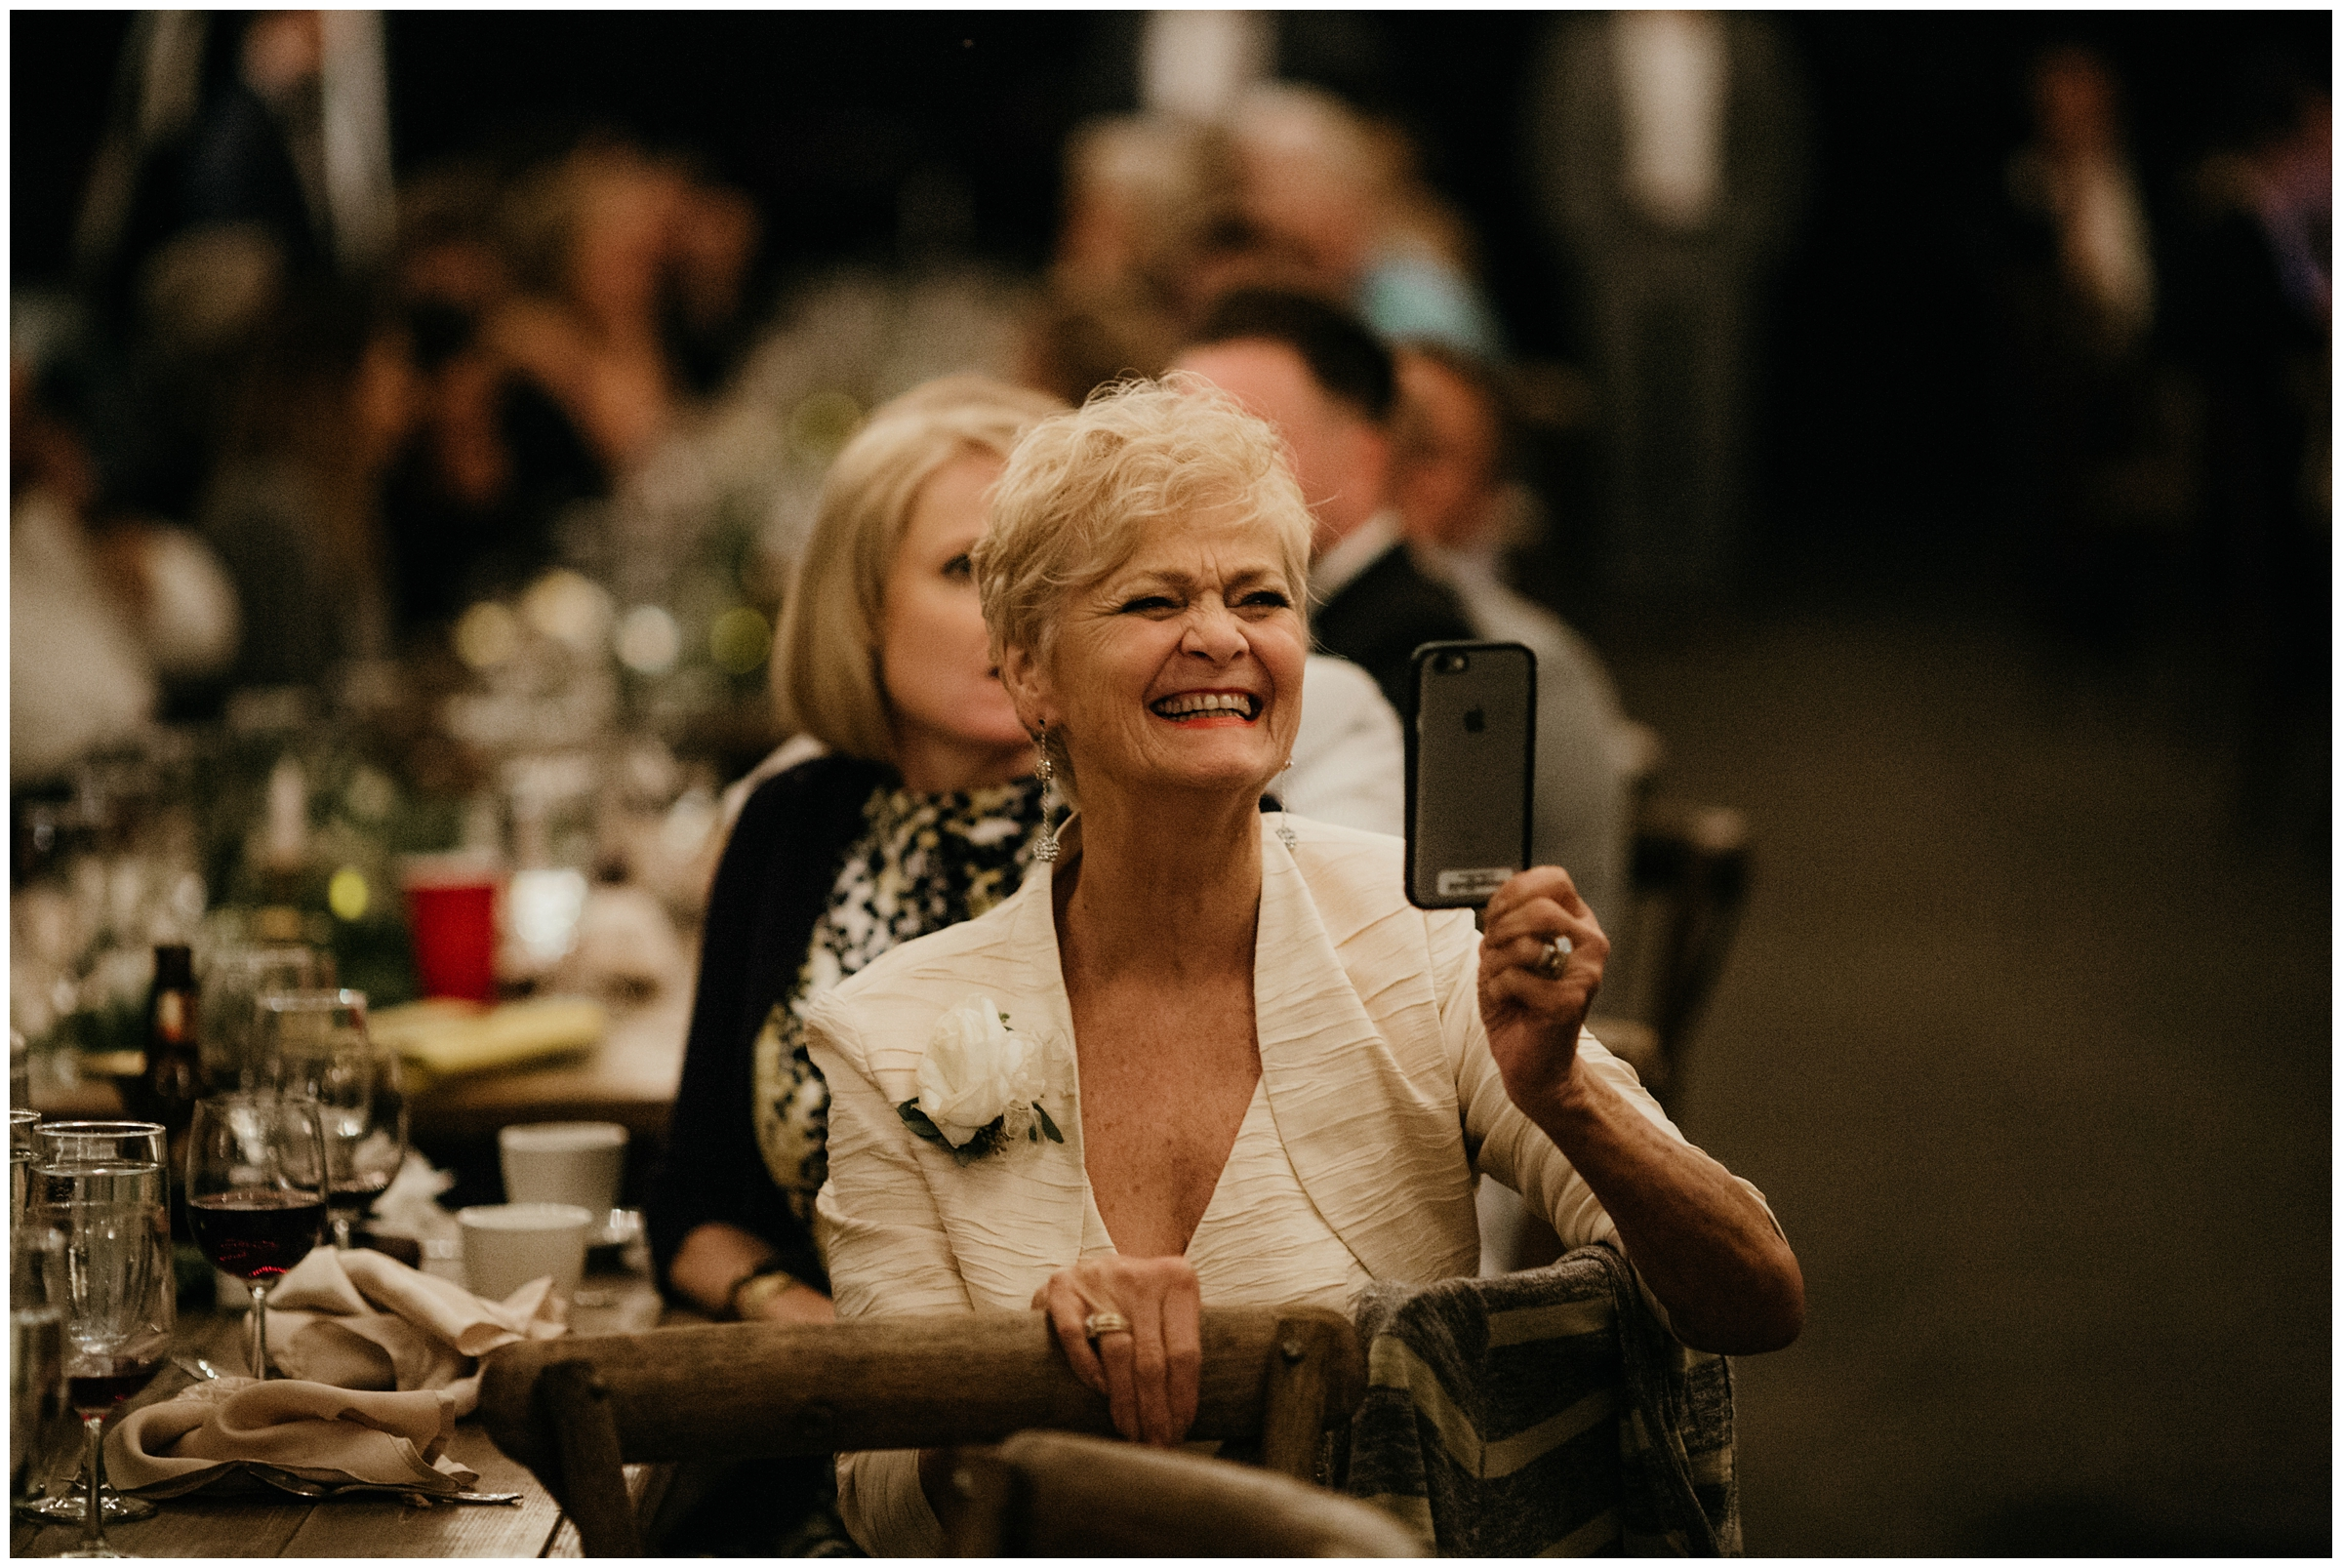 grandma smiling at wedding